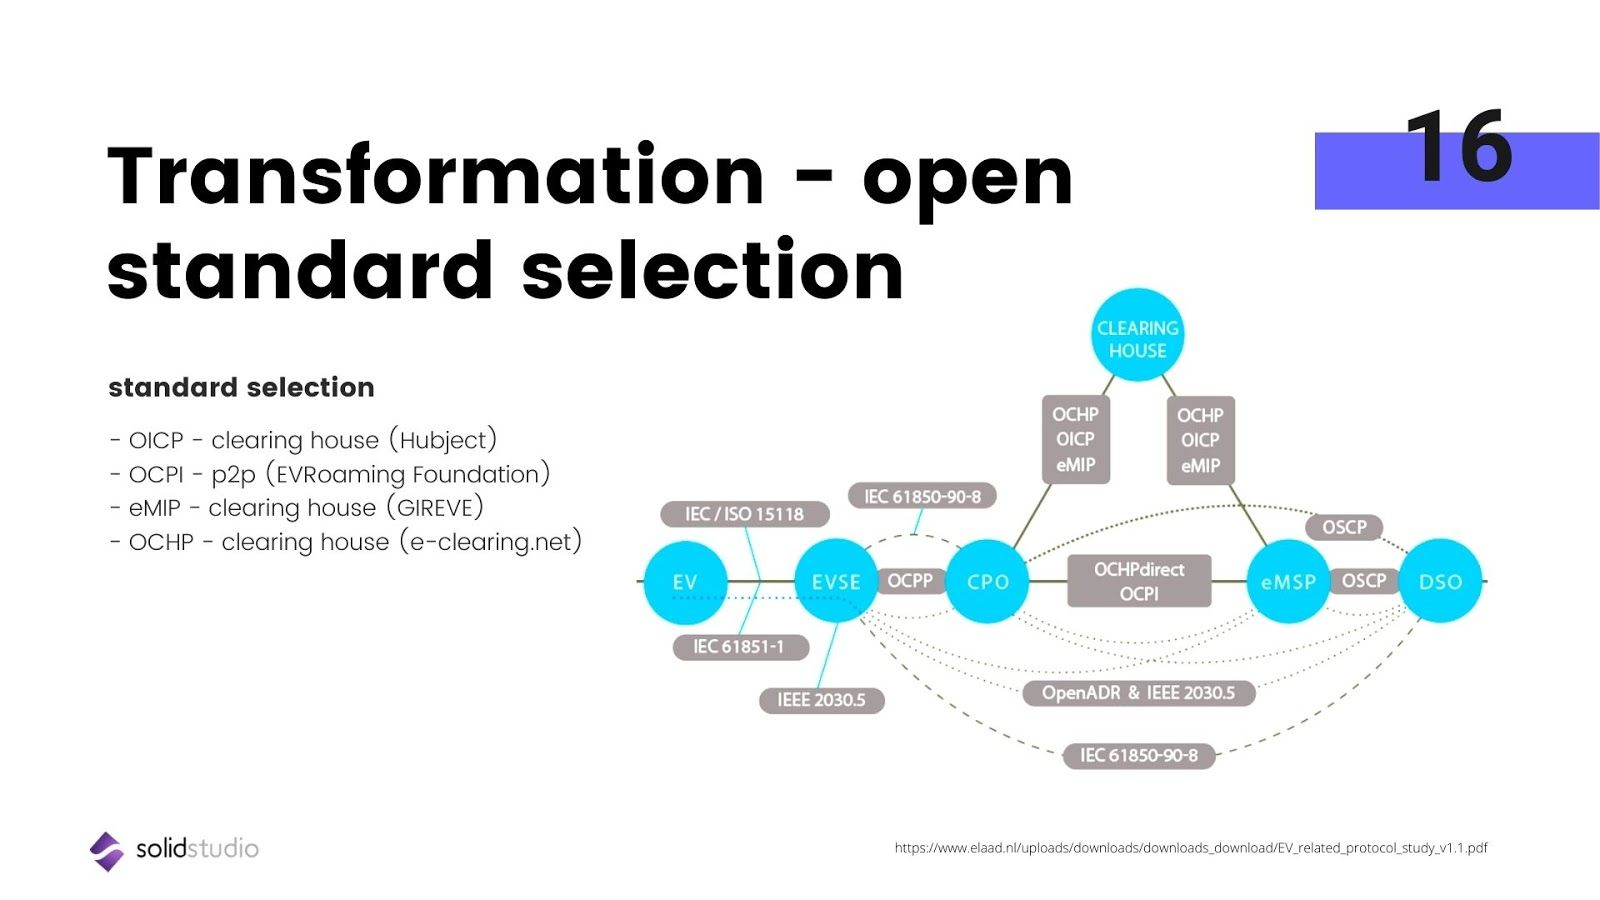 Unlocking eMobility platform using Open Standards - transformation